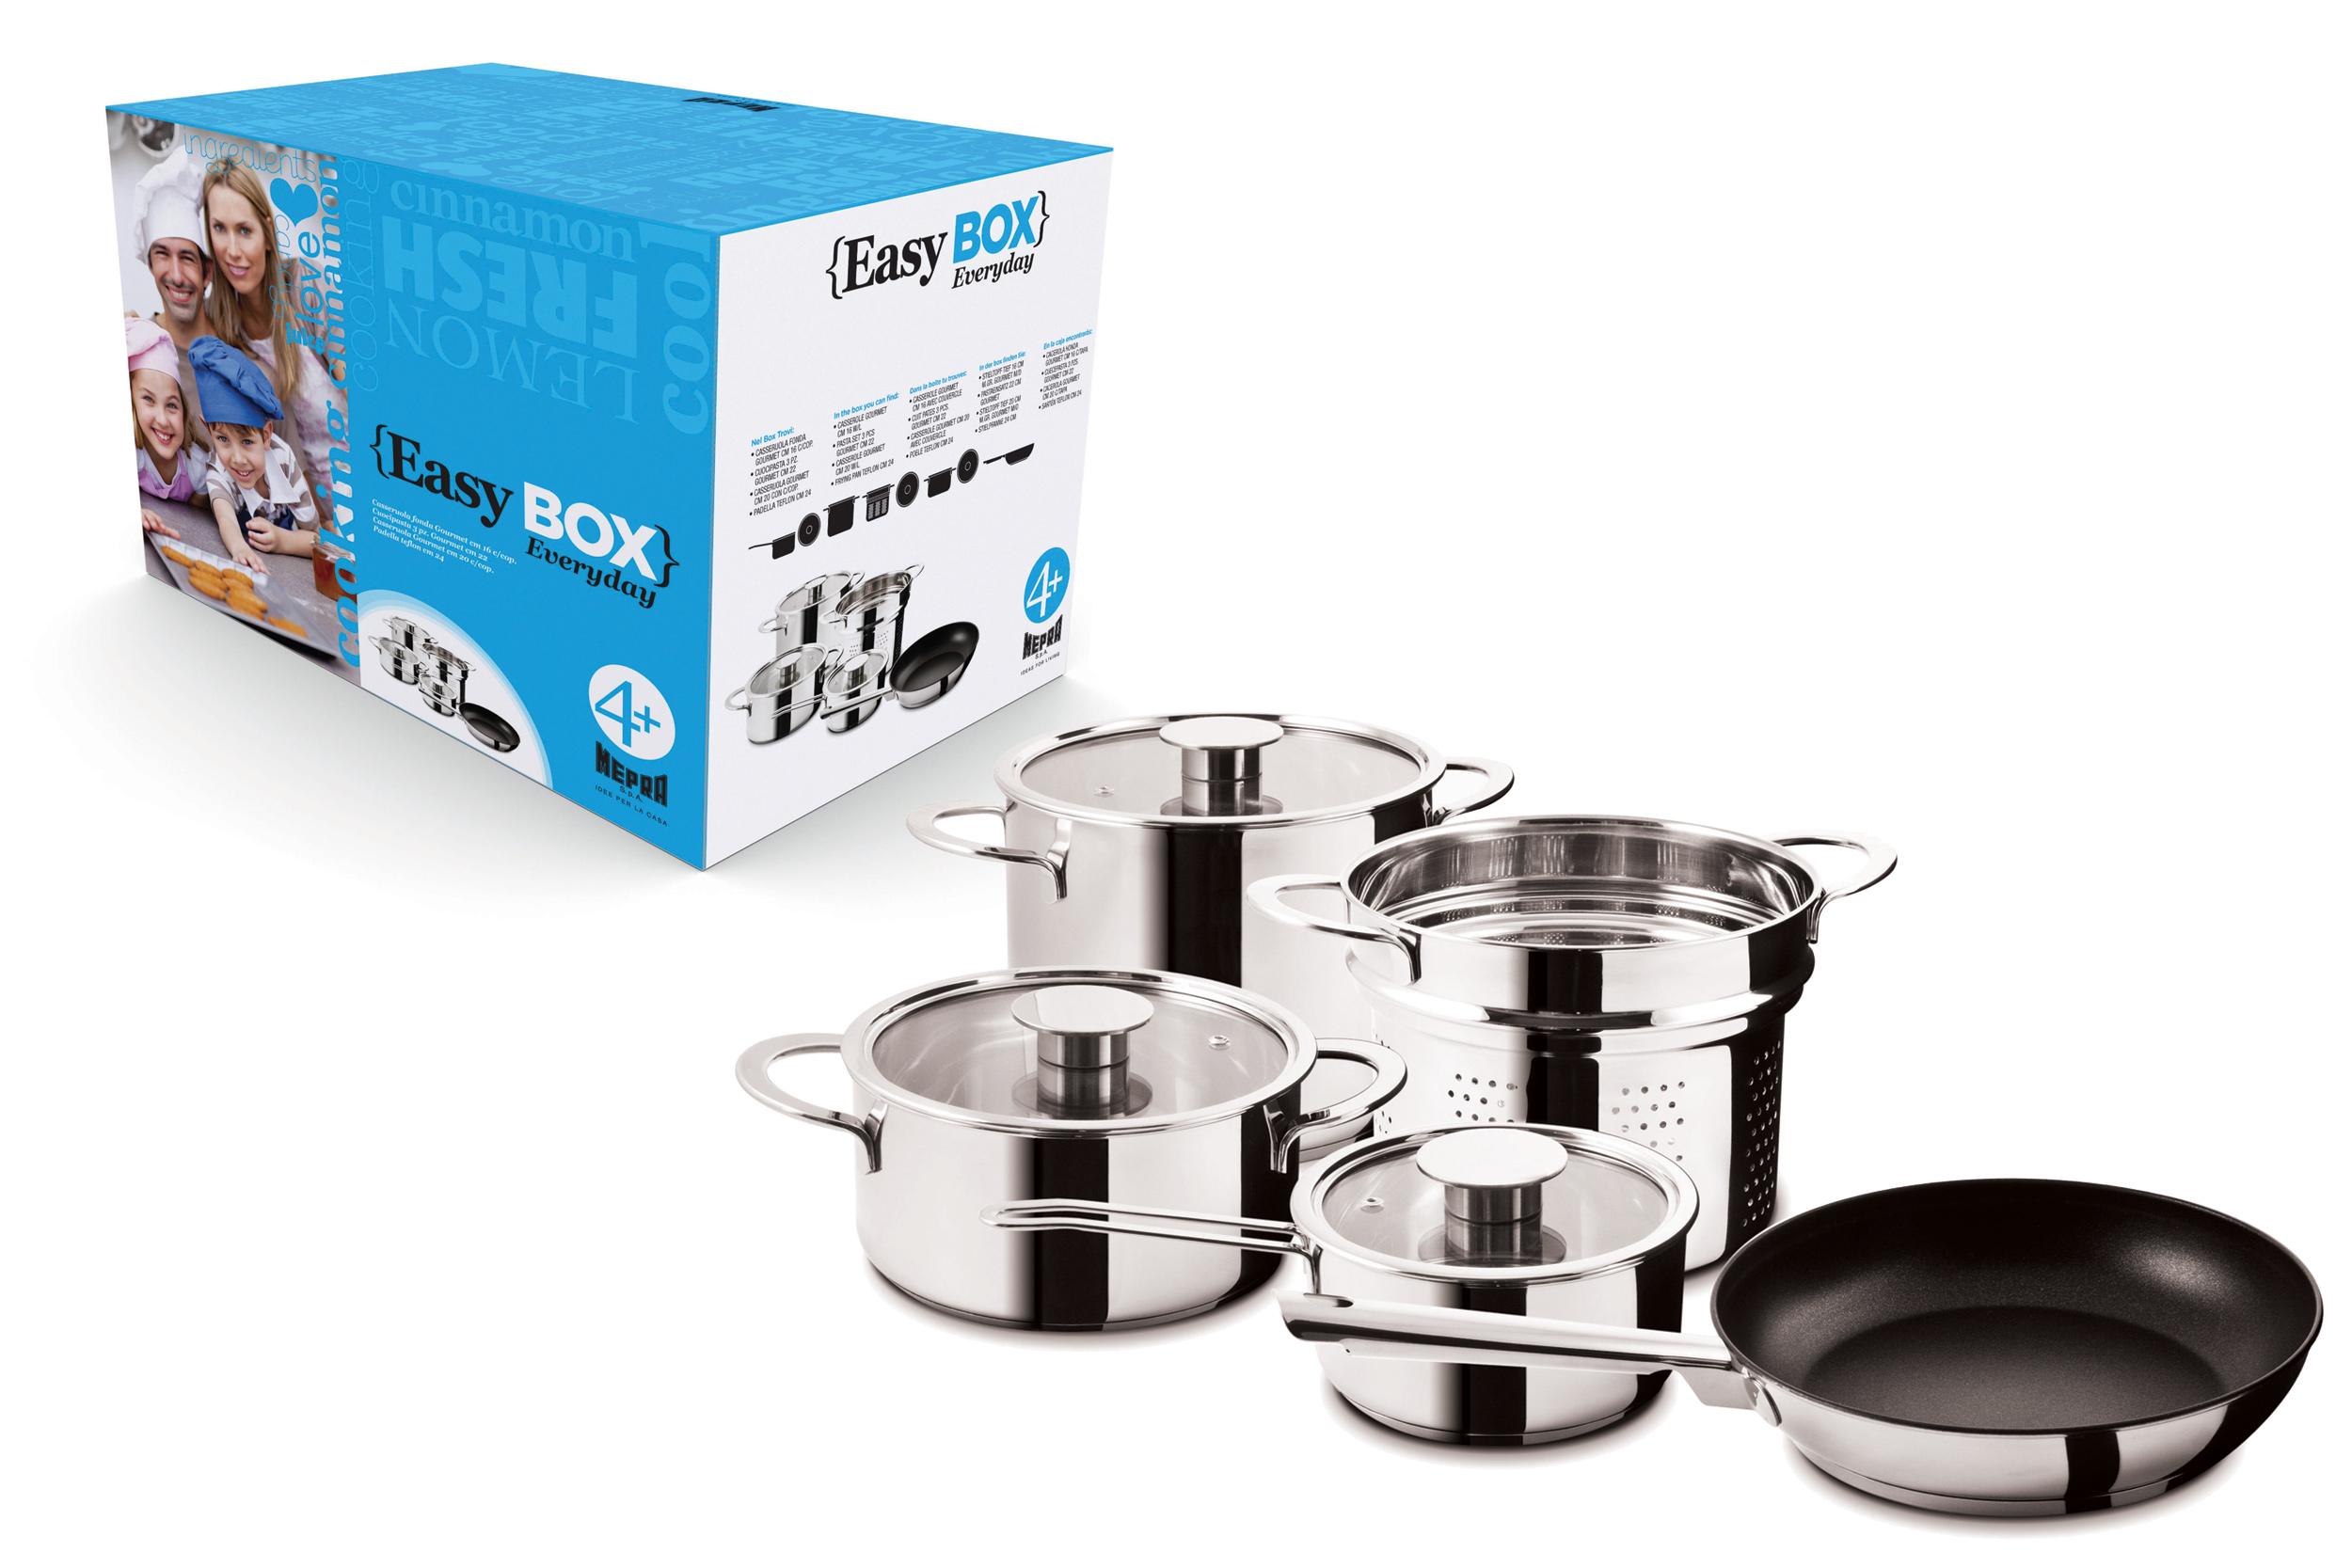 Easy Box 'Everyday / Gourmet' 4+   Mepra   0700953252791